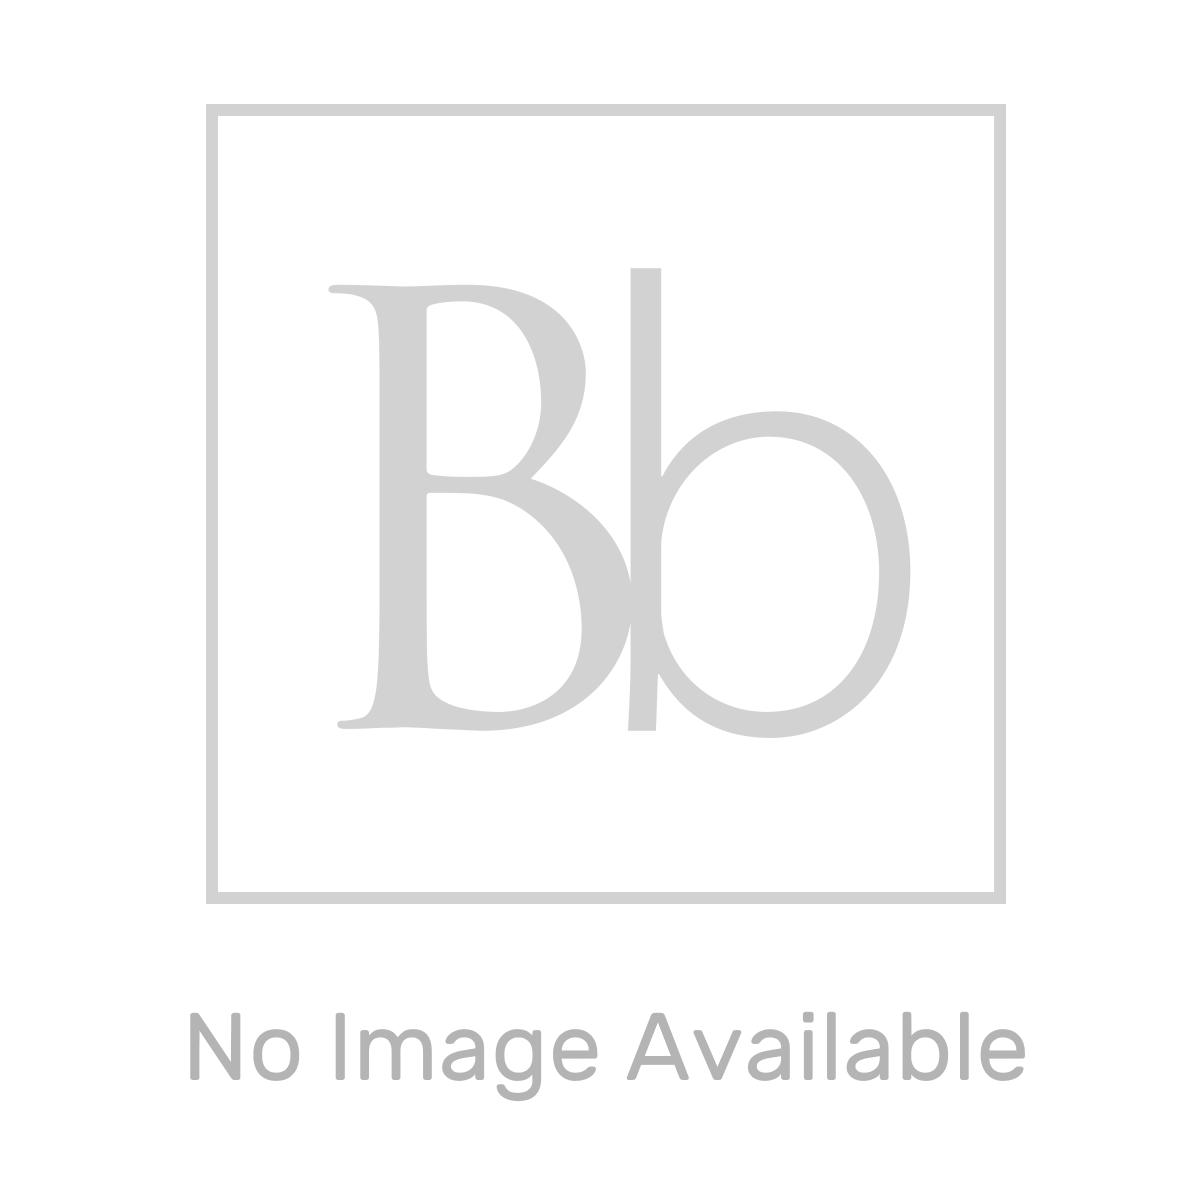 McAlpine WC-CON6 4